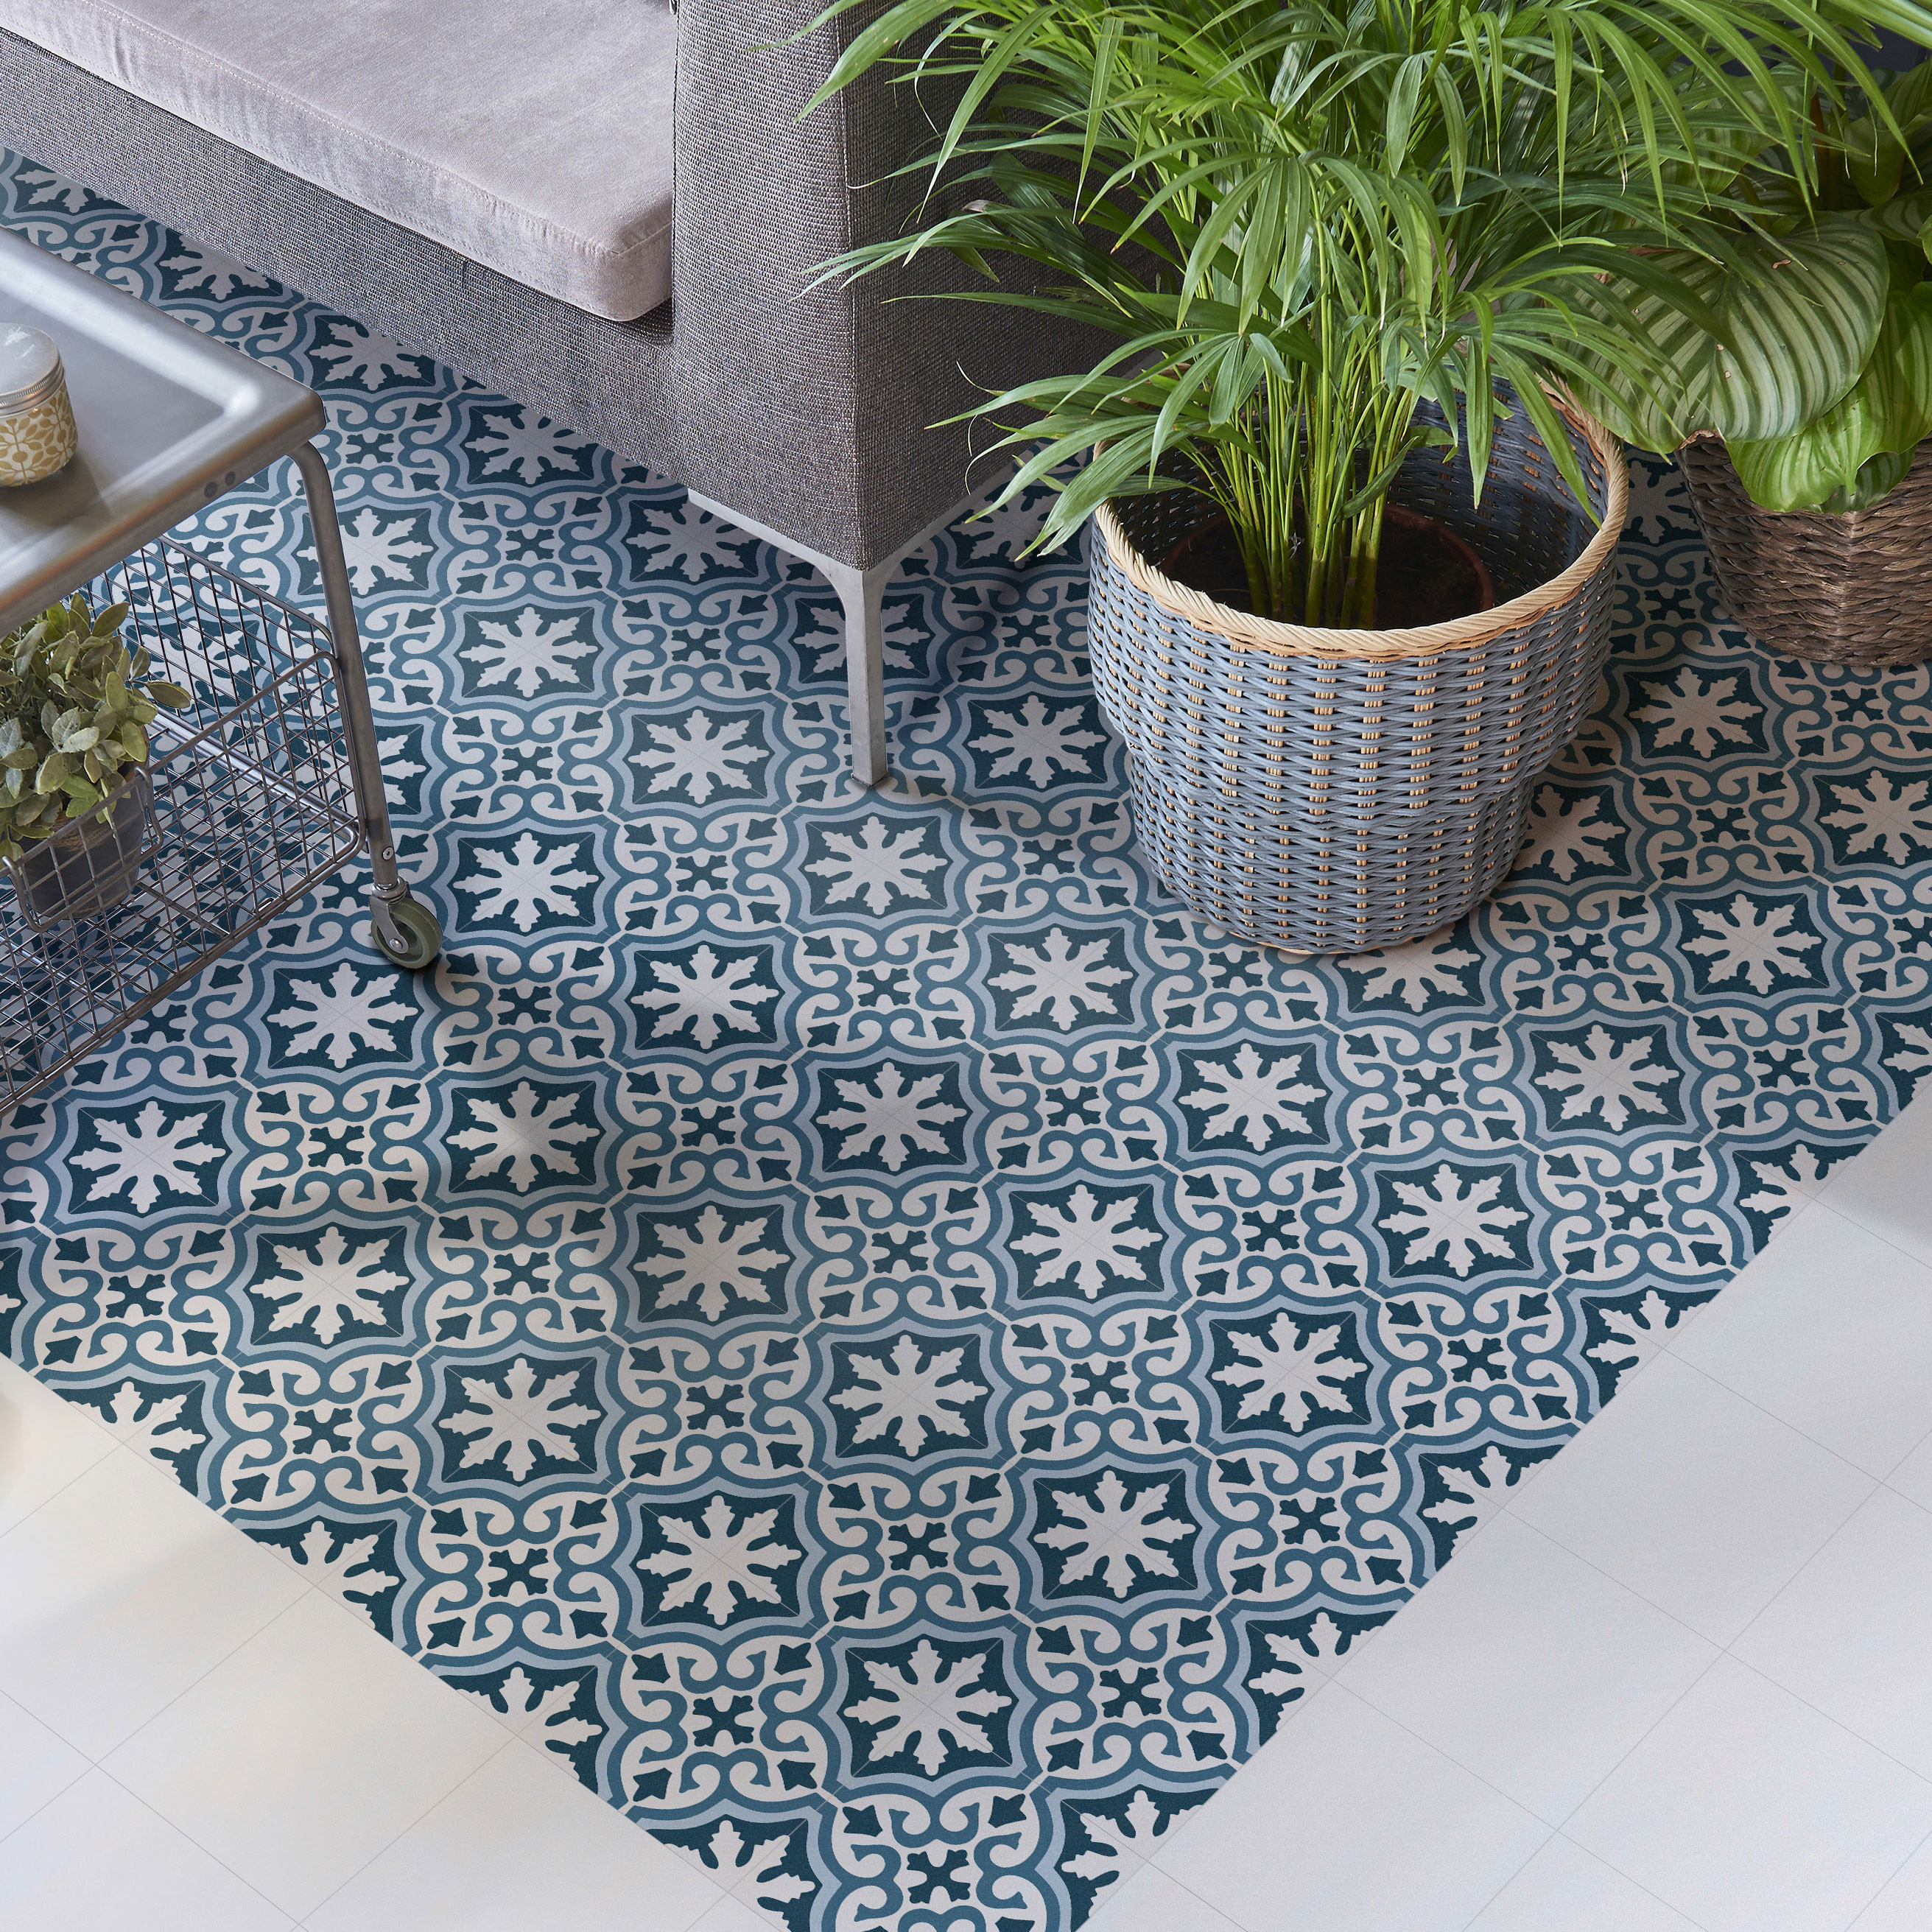 Carrelage sol et mur aspect carreau ciment multicolore bleu Valencia Lonja 25x25 cm